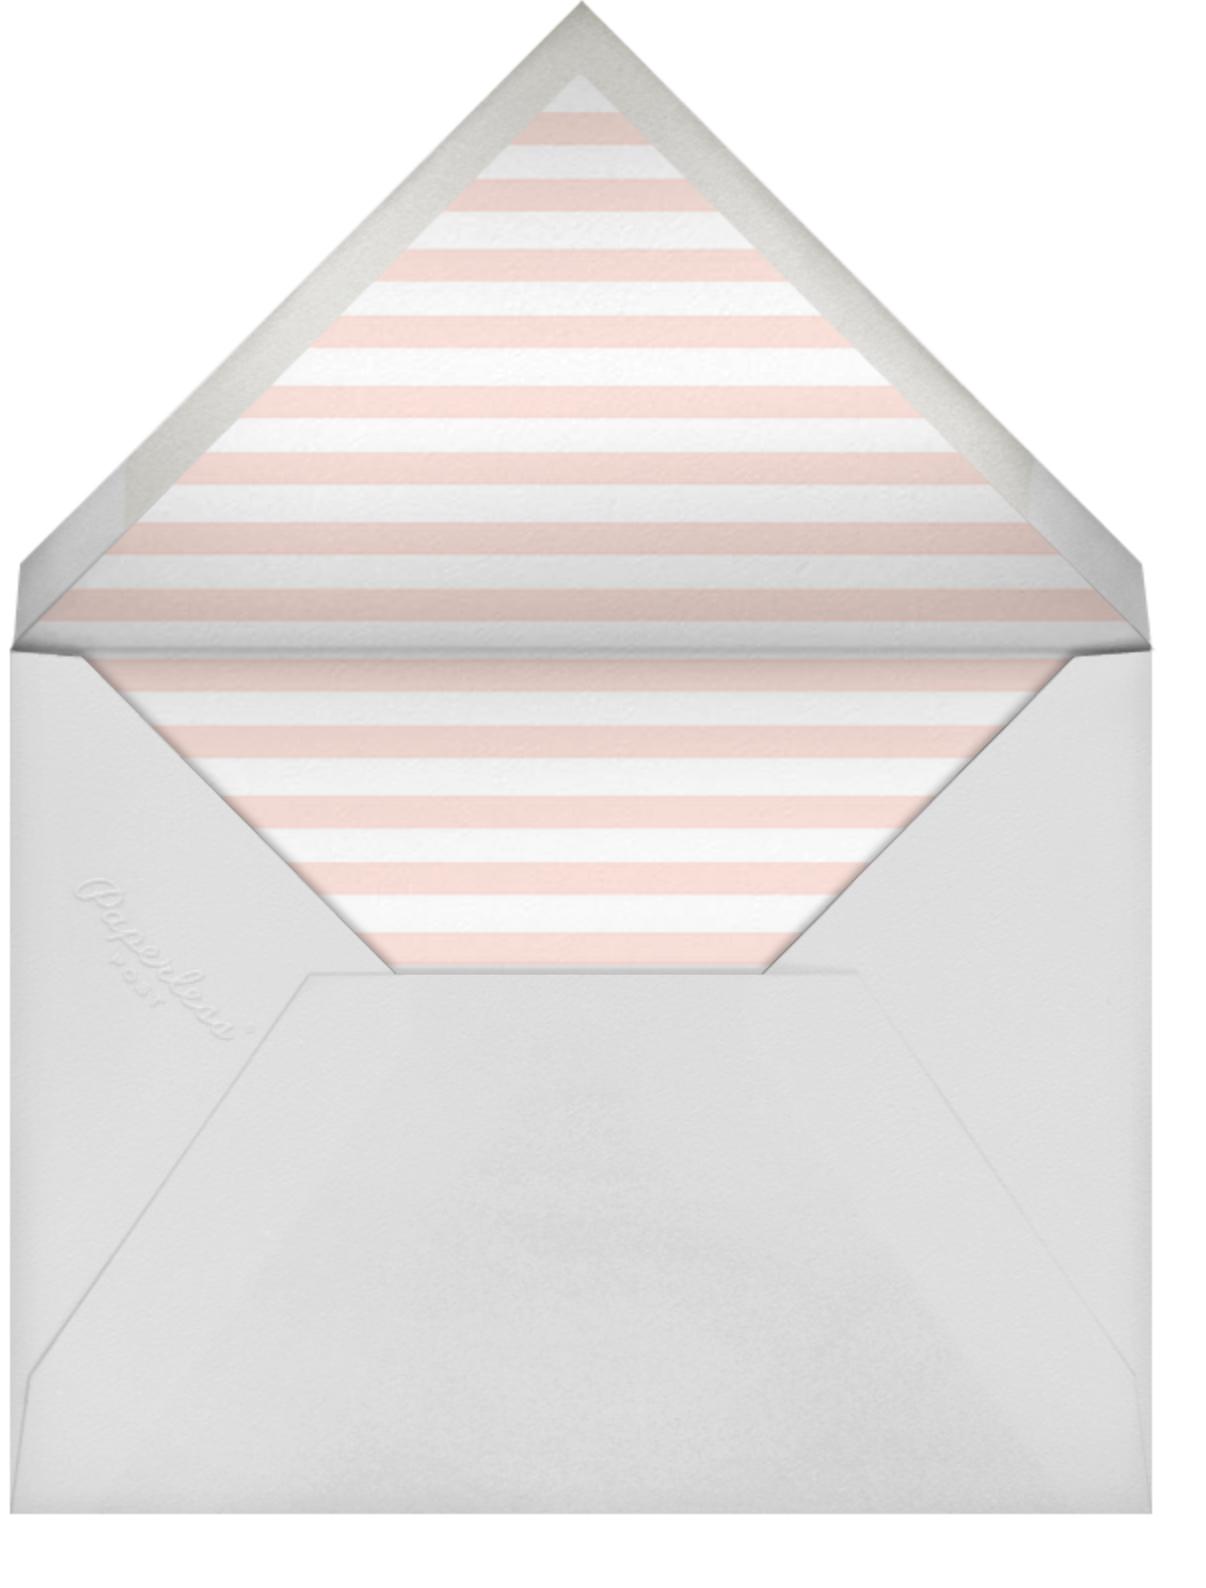 Balloon Birthday (Photo) - Pink - kate spade new york - Milk & Cookies - envelope back